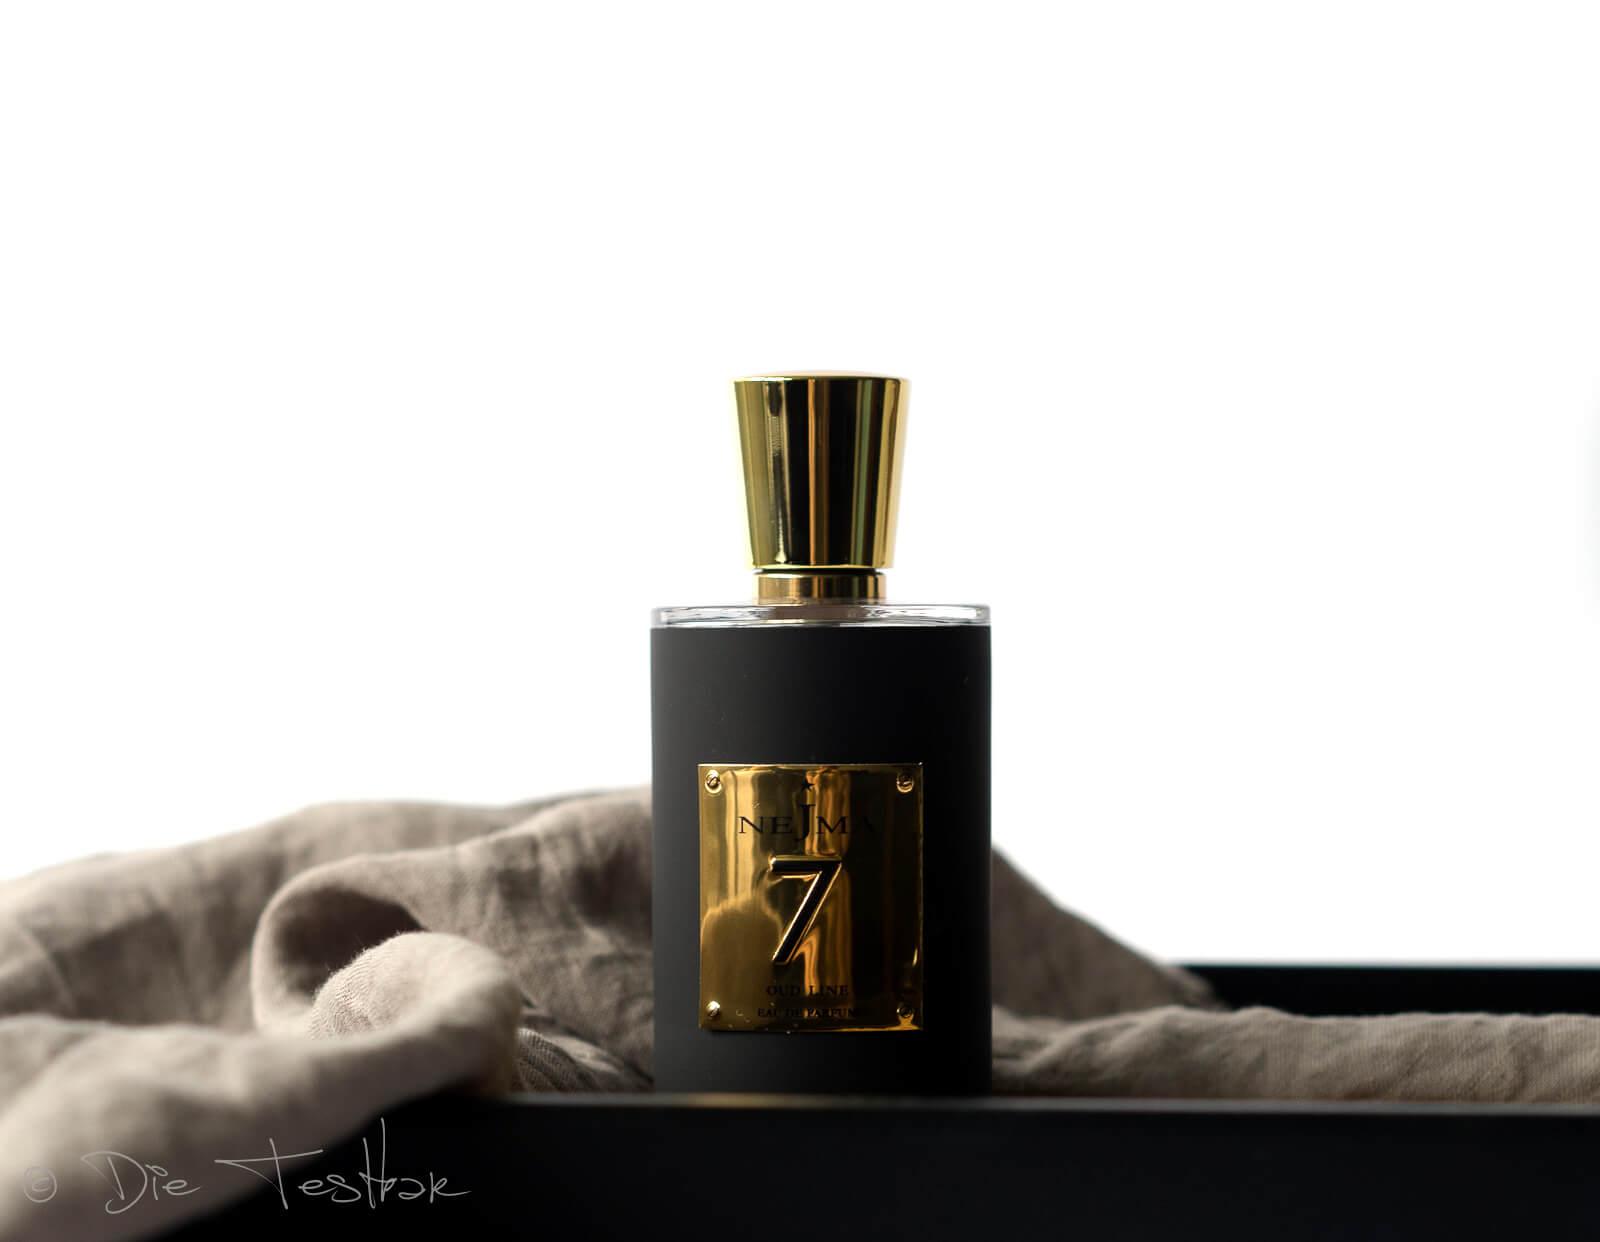 Isis Parfums Diffusion - KoEptYs - Eau de Parfum - Der erste Promi Luxus Duft von Booba by Nejma